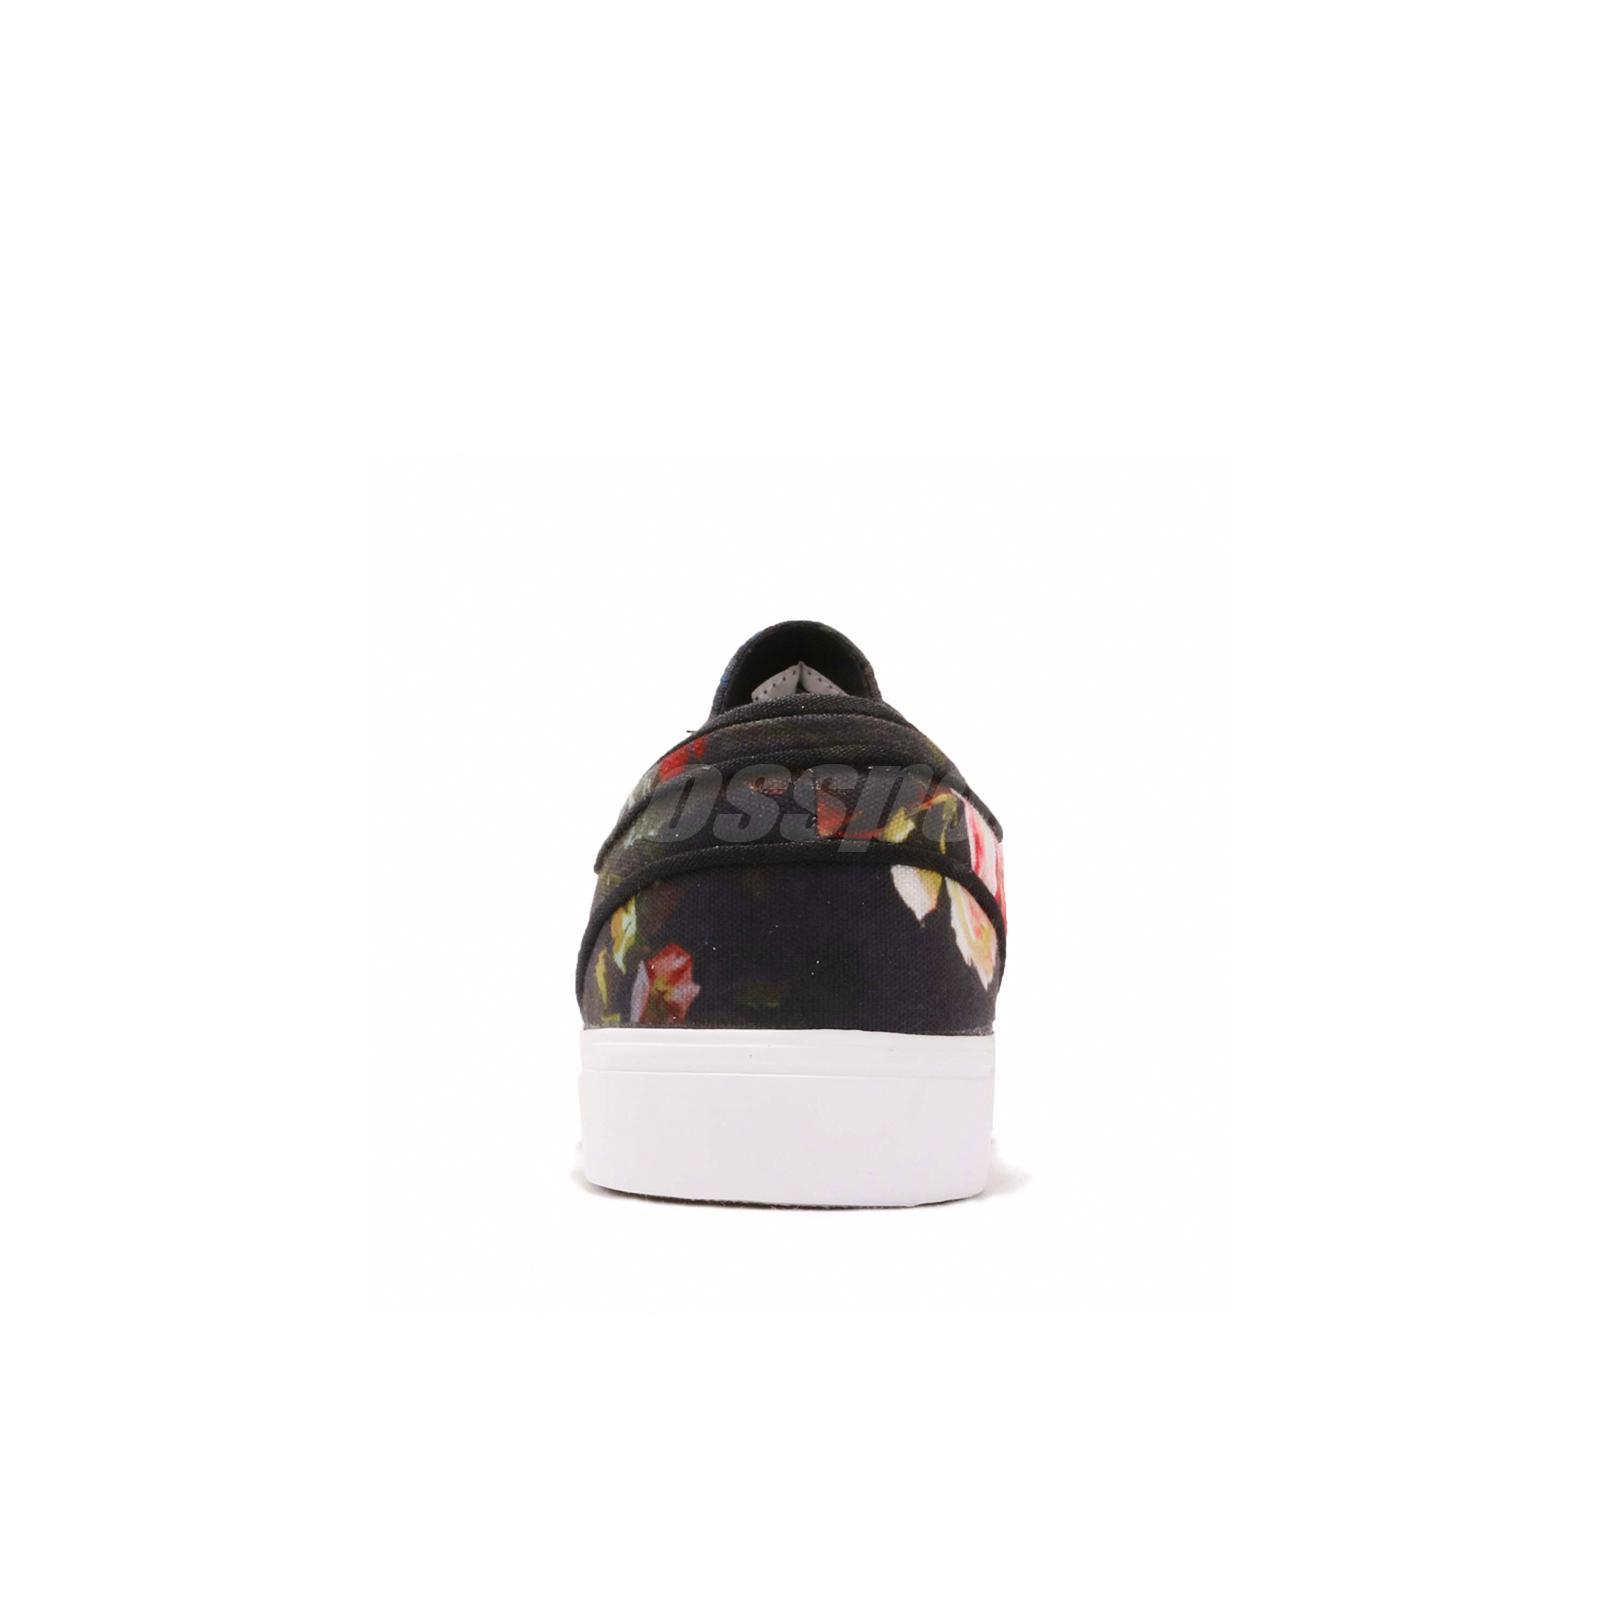 Details about Nike SB Zoom Stefan Janoski Canvas Black Floral Skateboarding Shoes 615957 900